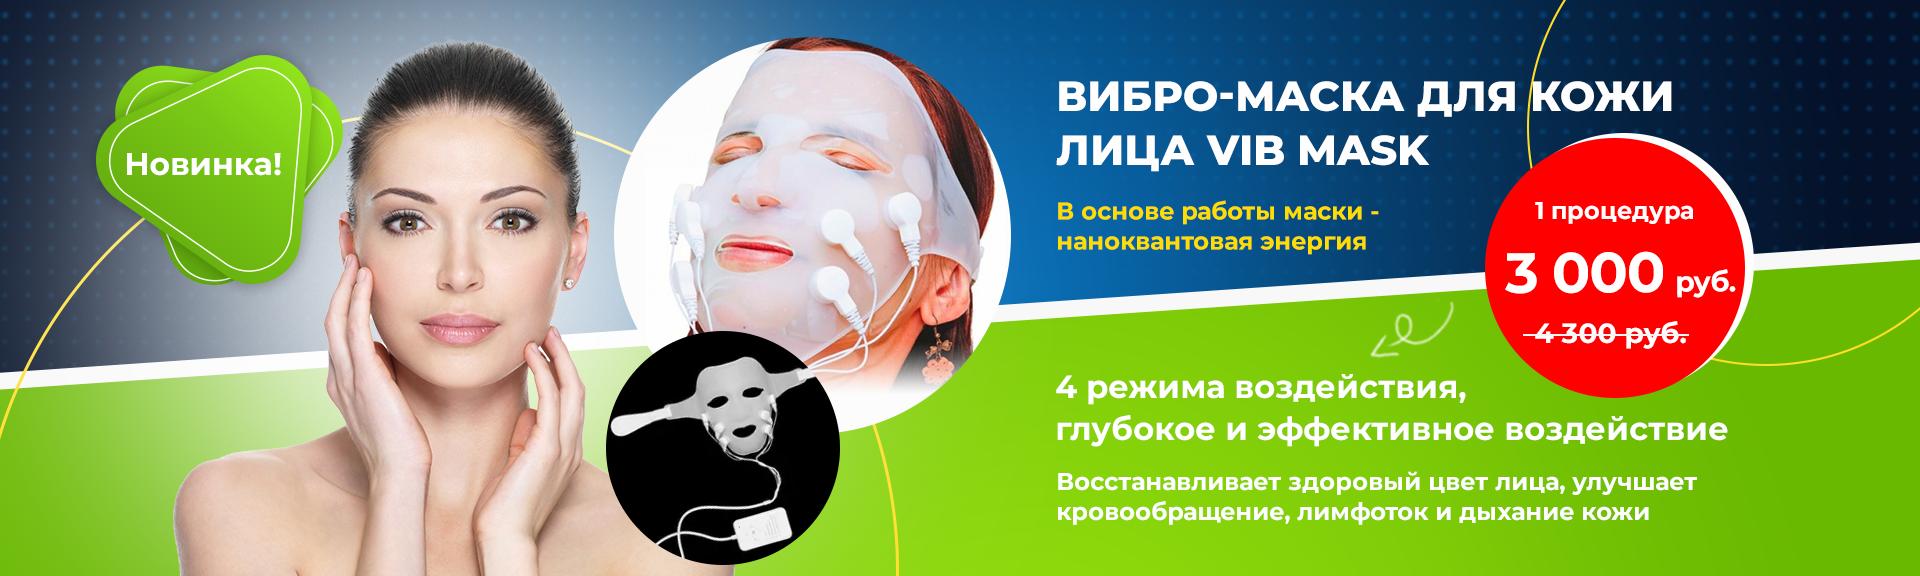 Вибро-маска для кожи лица VIB Mask